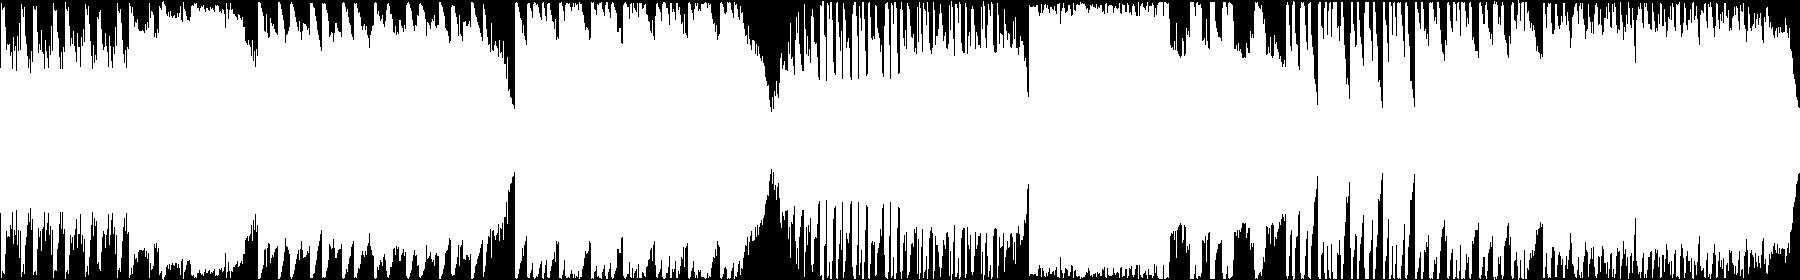 Evasion Lo-Fi audio waveform